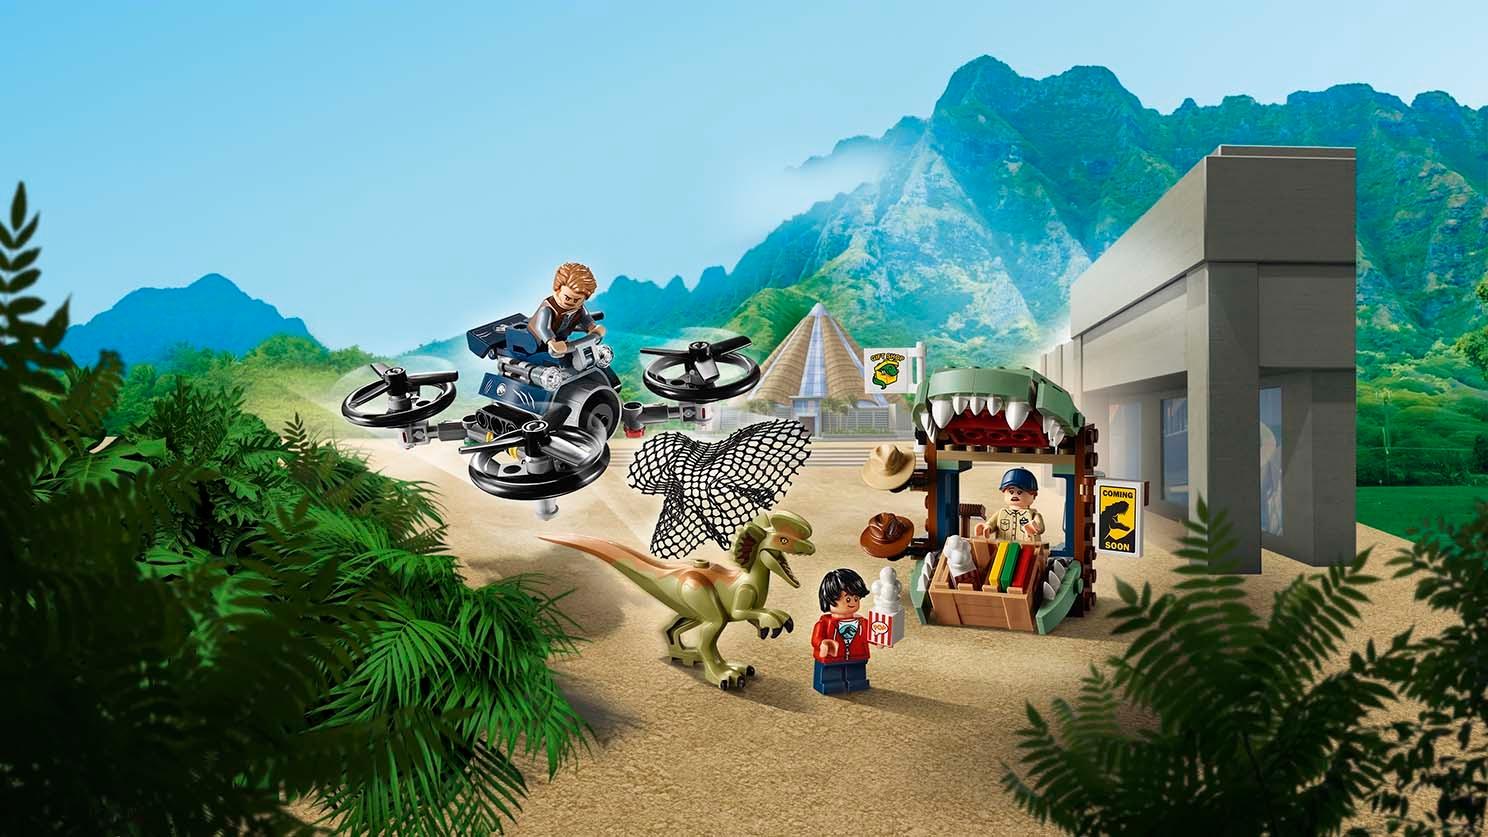 - NEW LEGO Jurassic World JW046 Hudson Harper Minifigure #75934